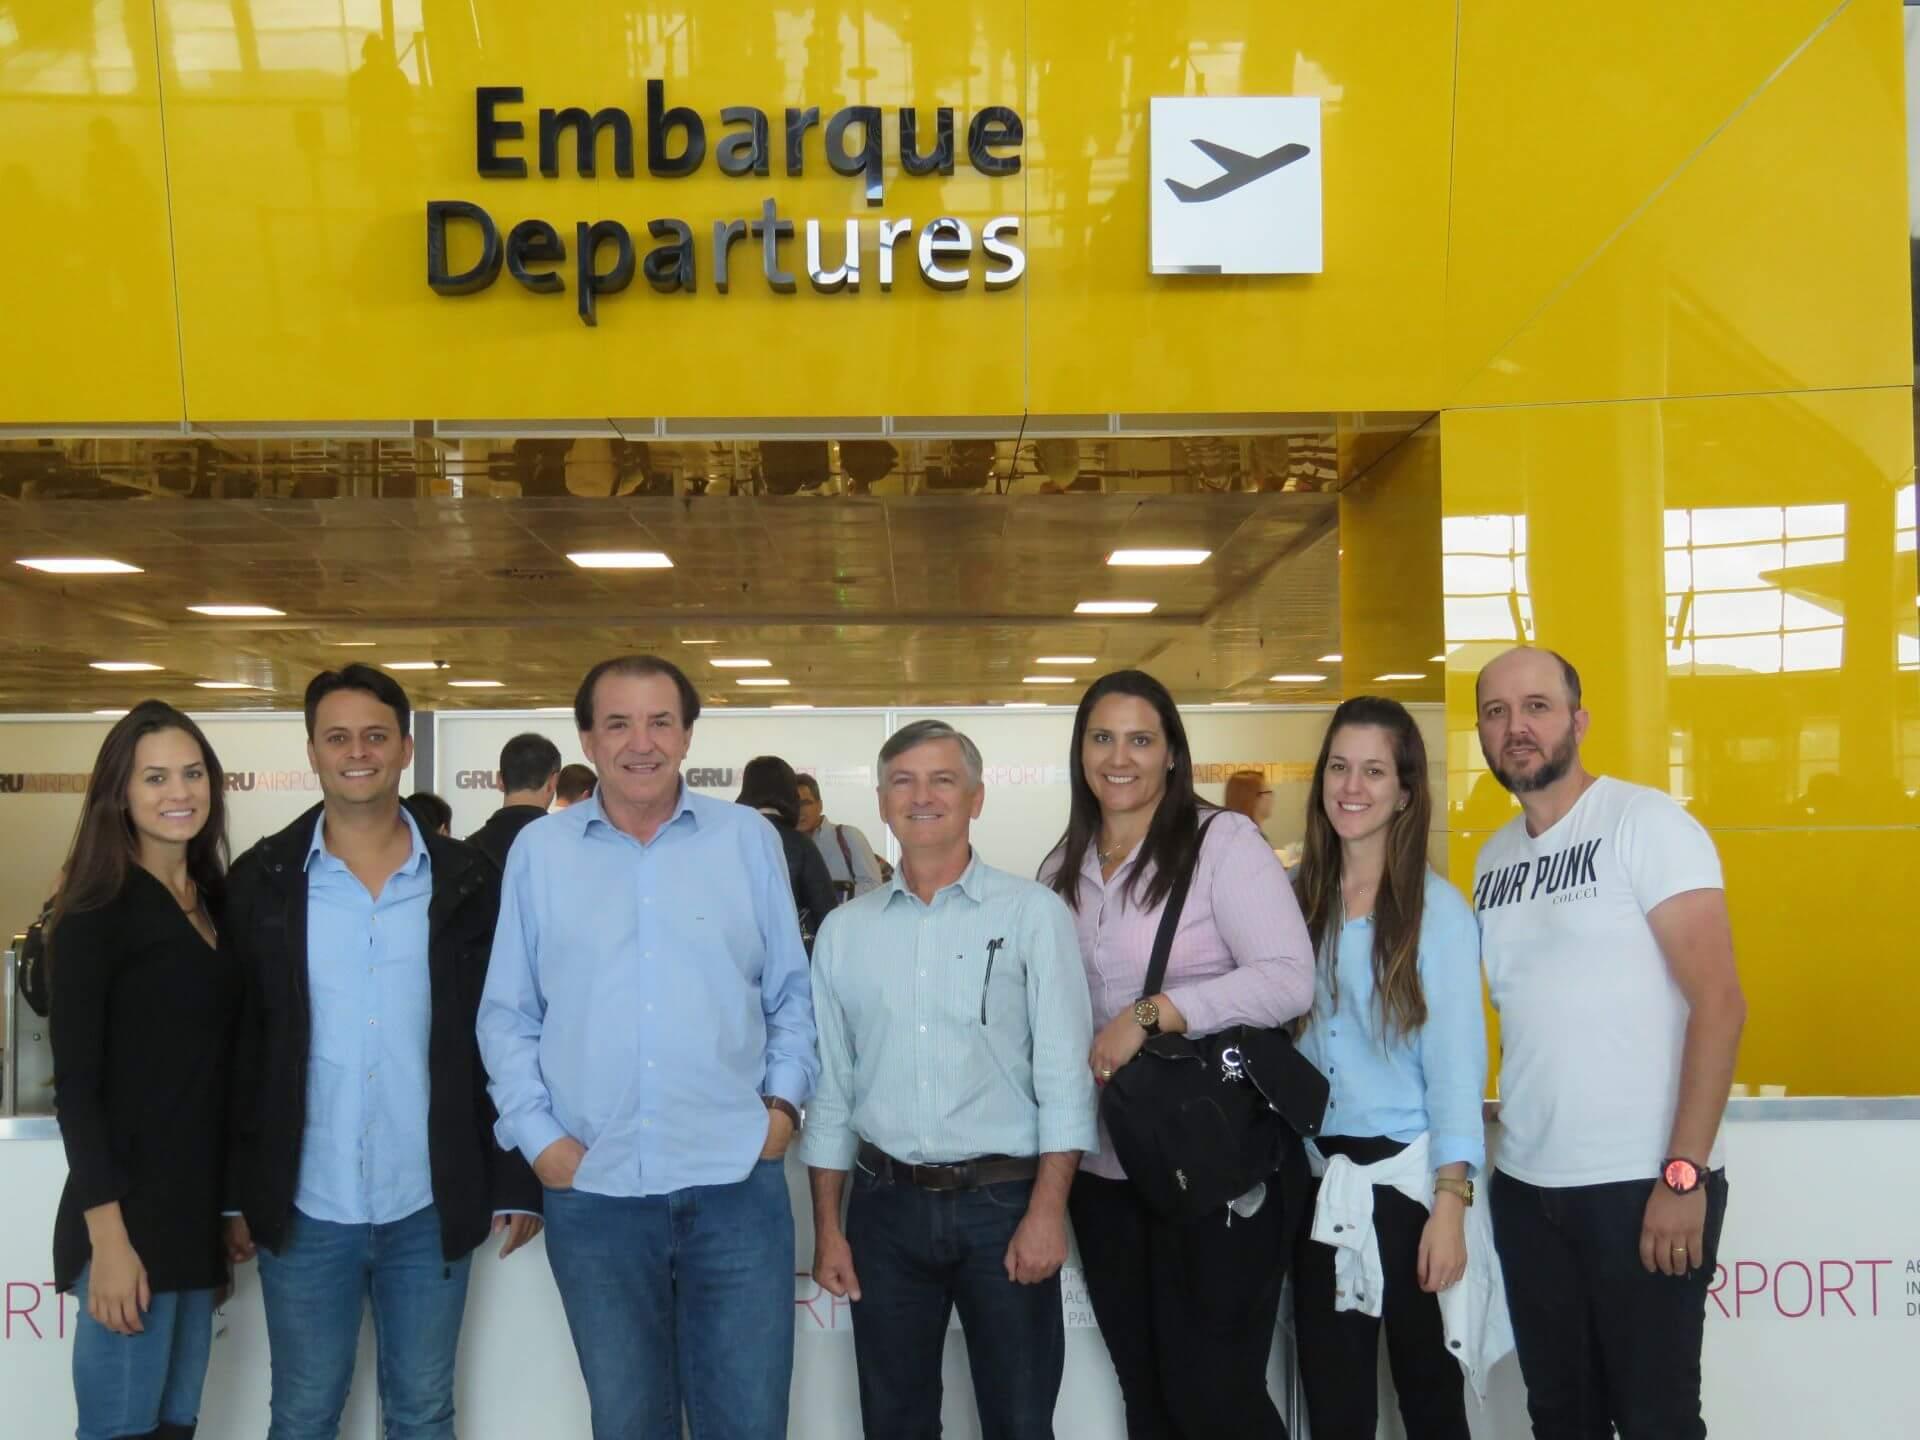 Comitiva de Brusque participa de workshop internacional na Alemanha